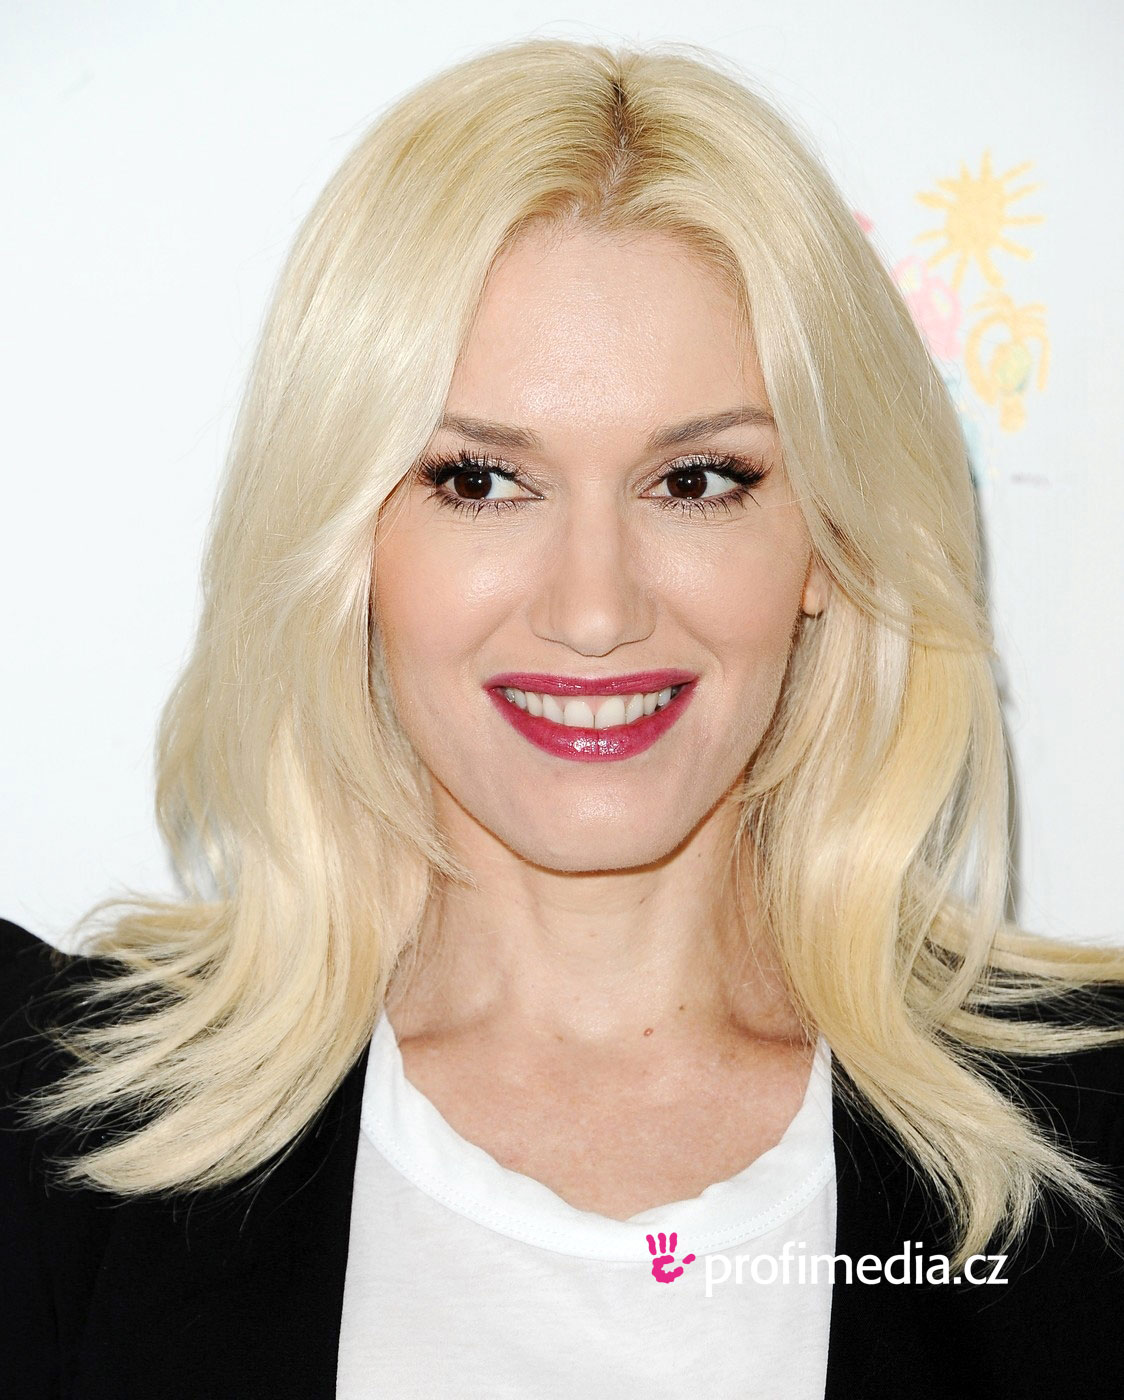 Gwen Stefani Hairstyle Easyhairstyler